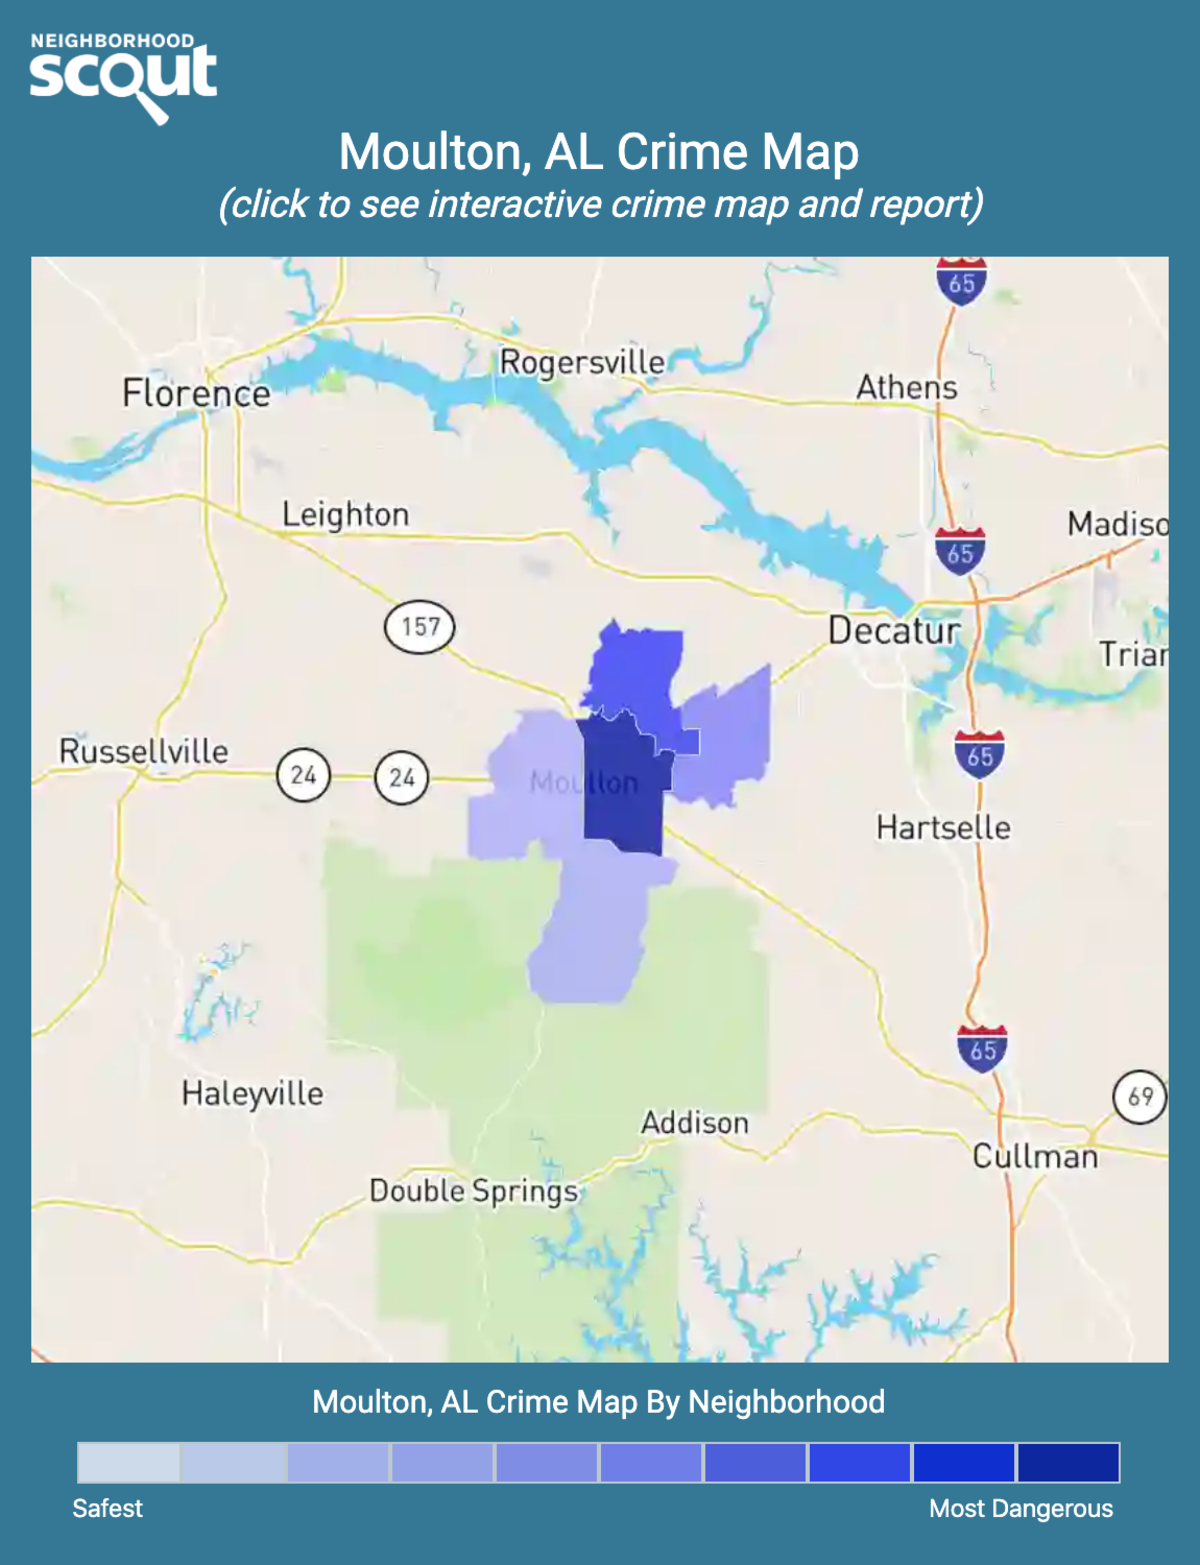 Moulton, Alabama crime map